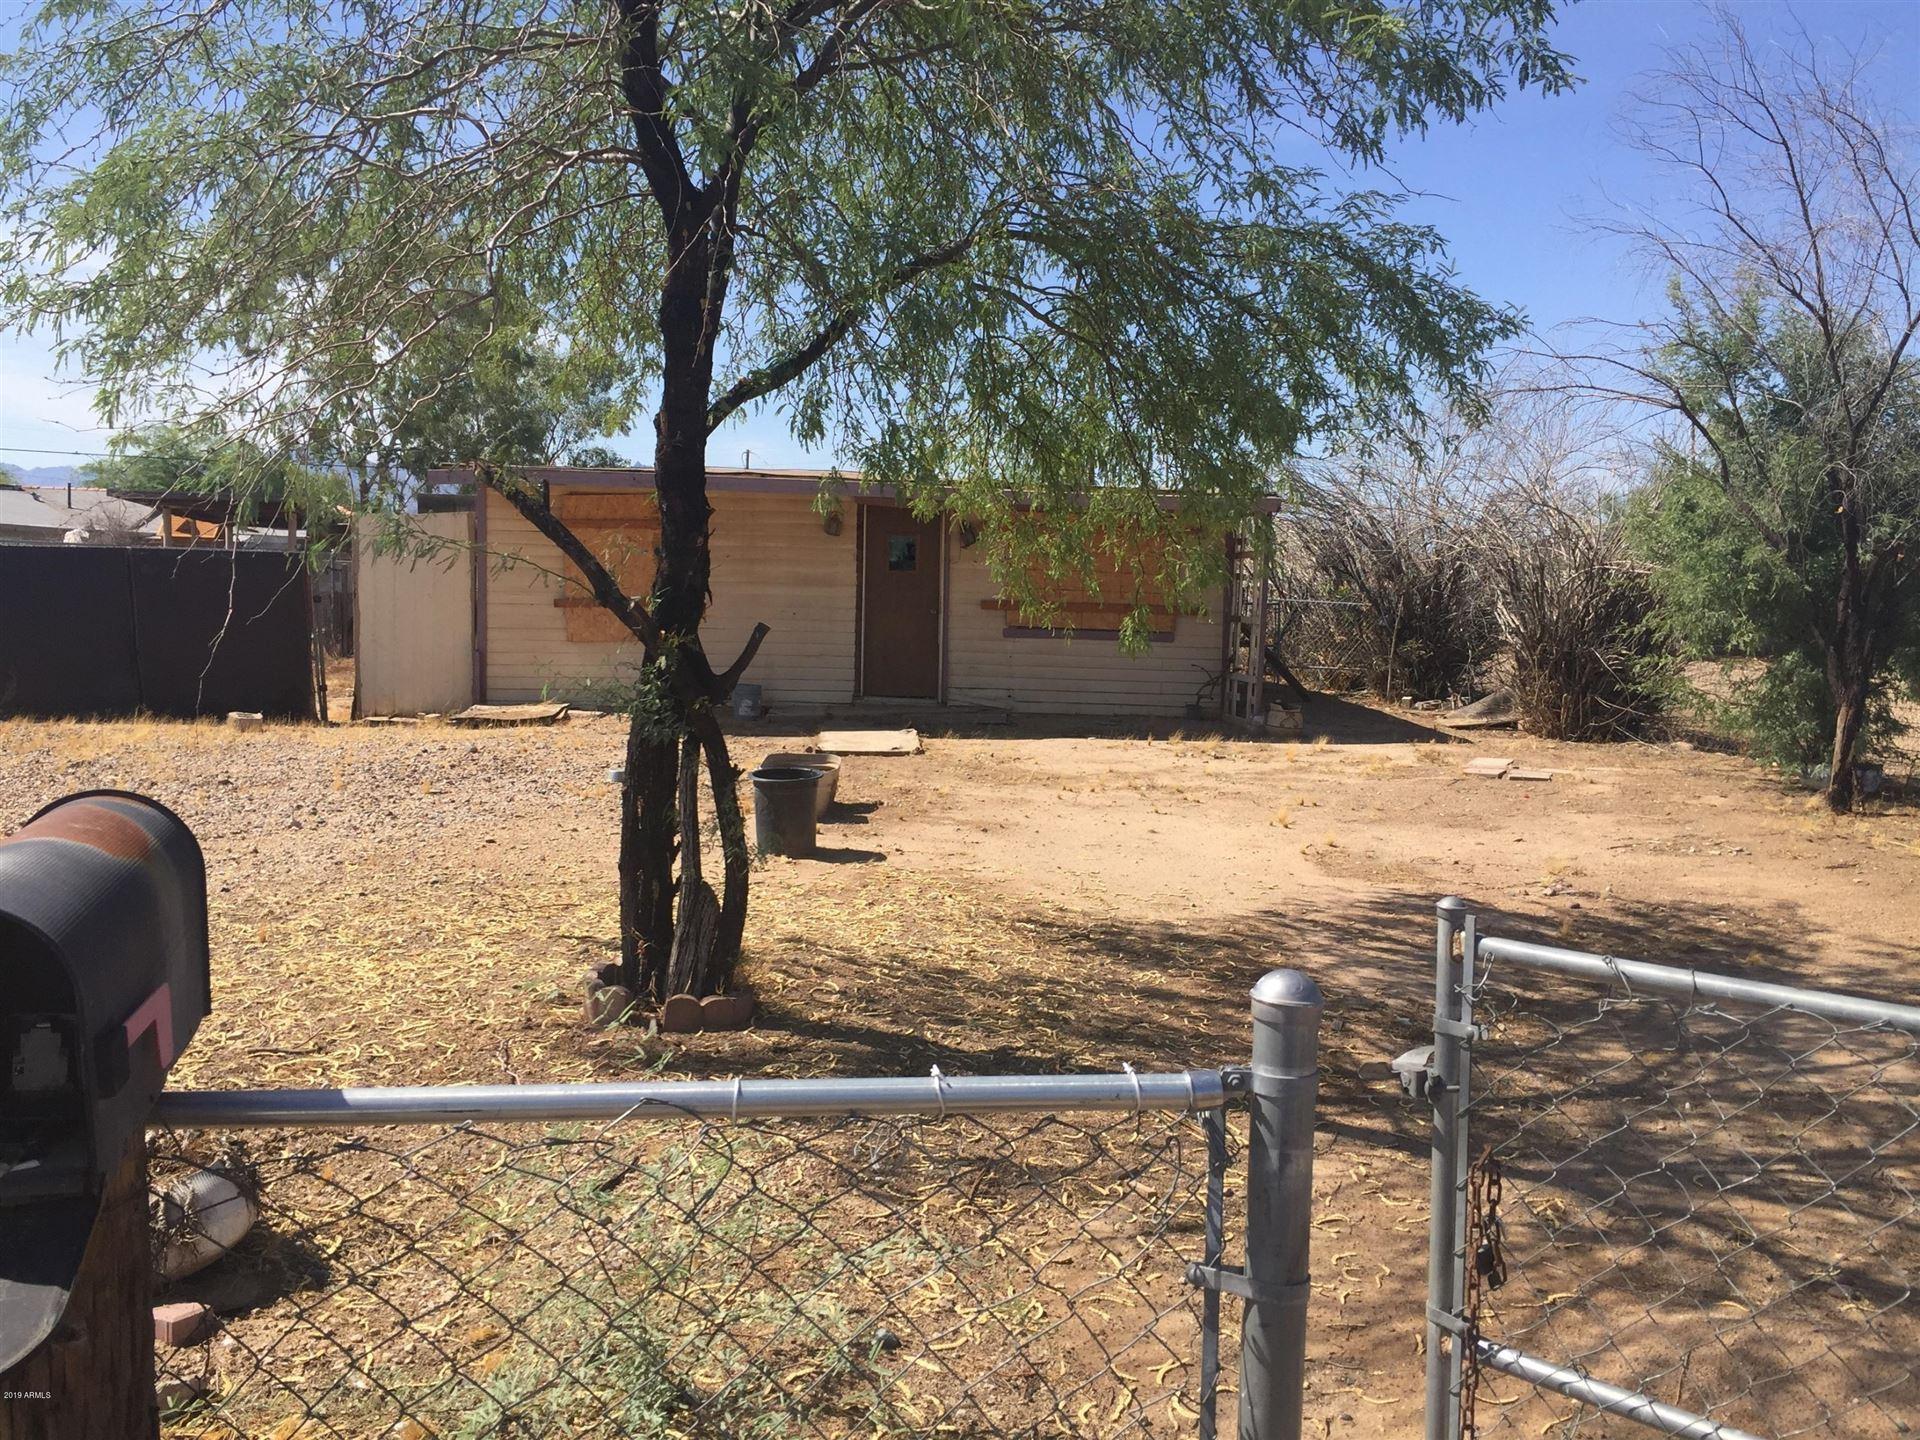 511 E Corrall Street, Avondale, AZ 85323 - MLS#: 5971346